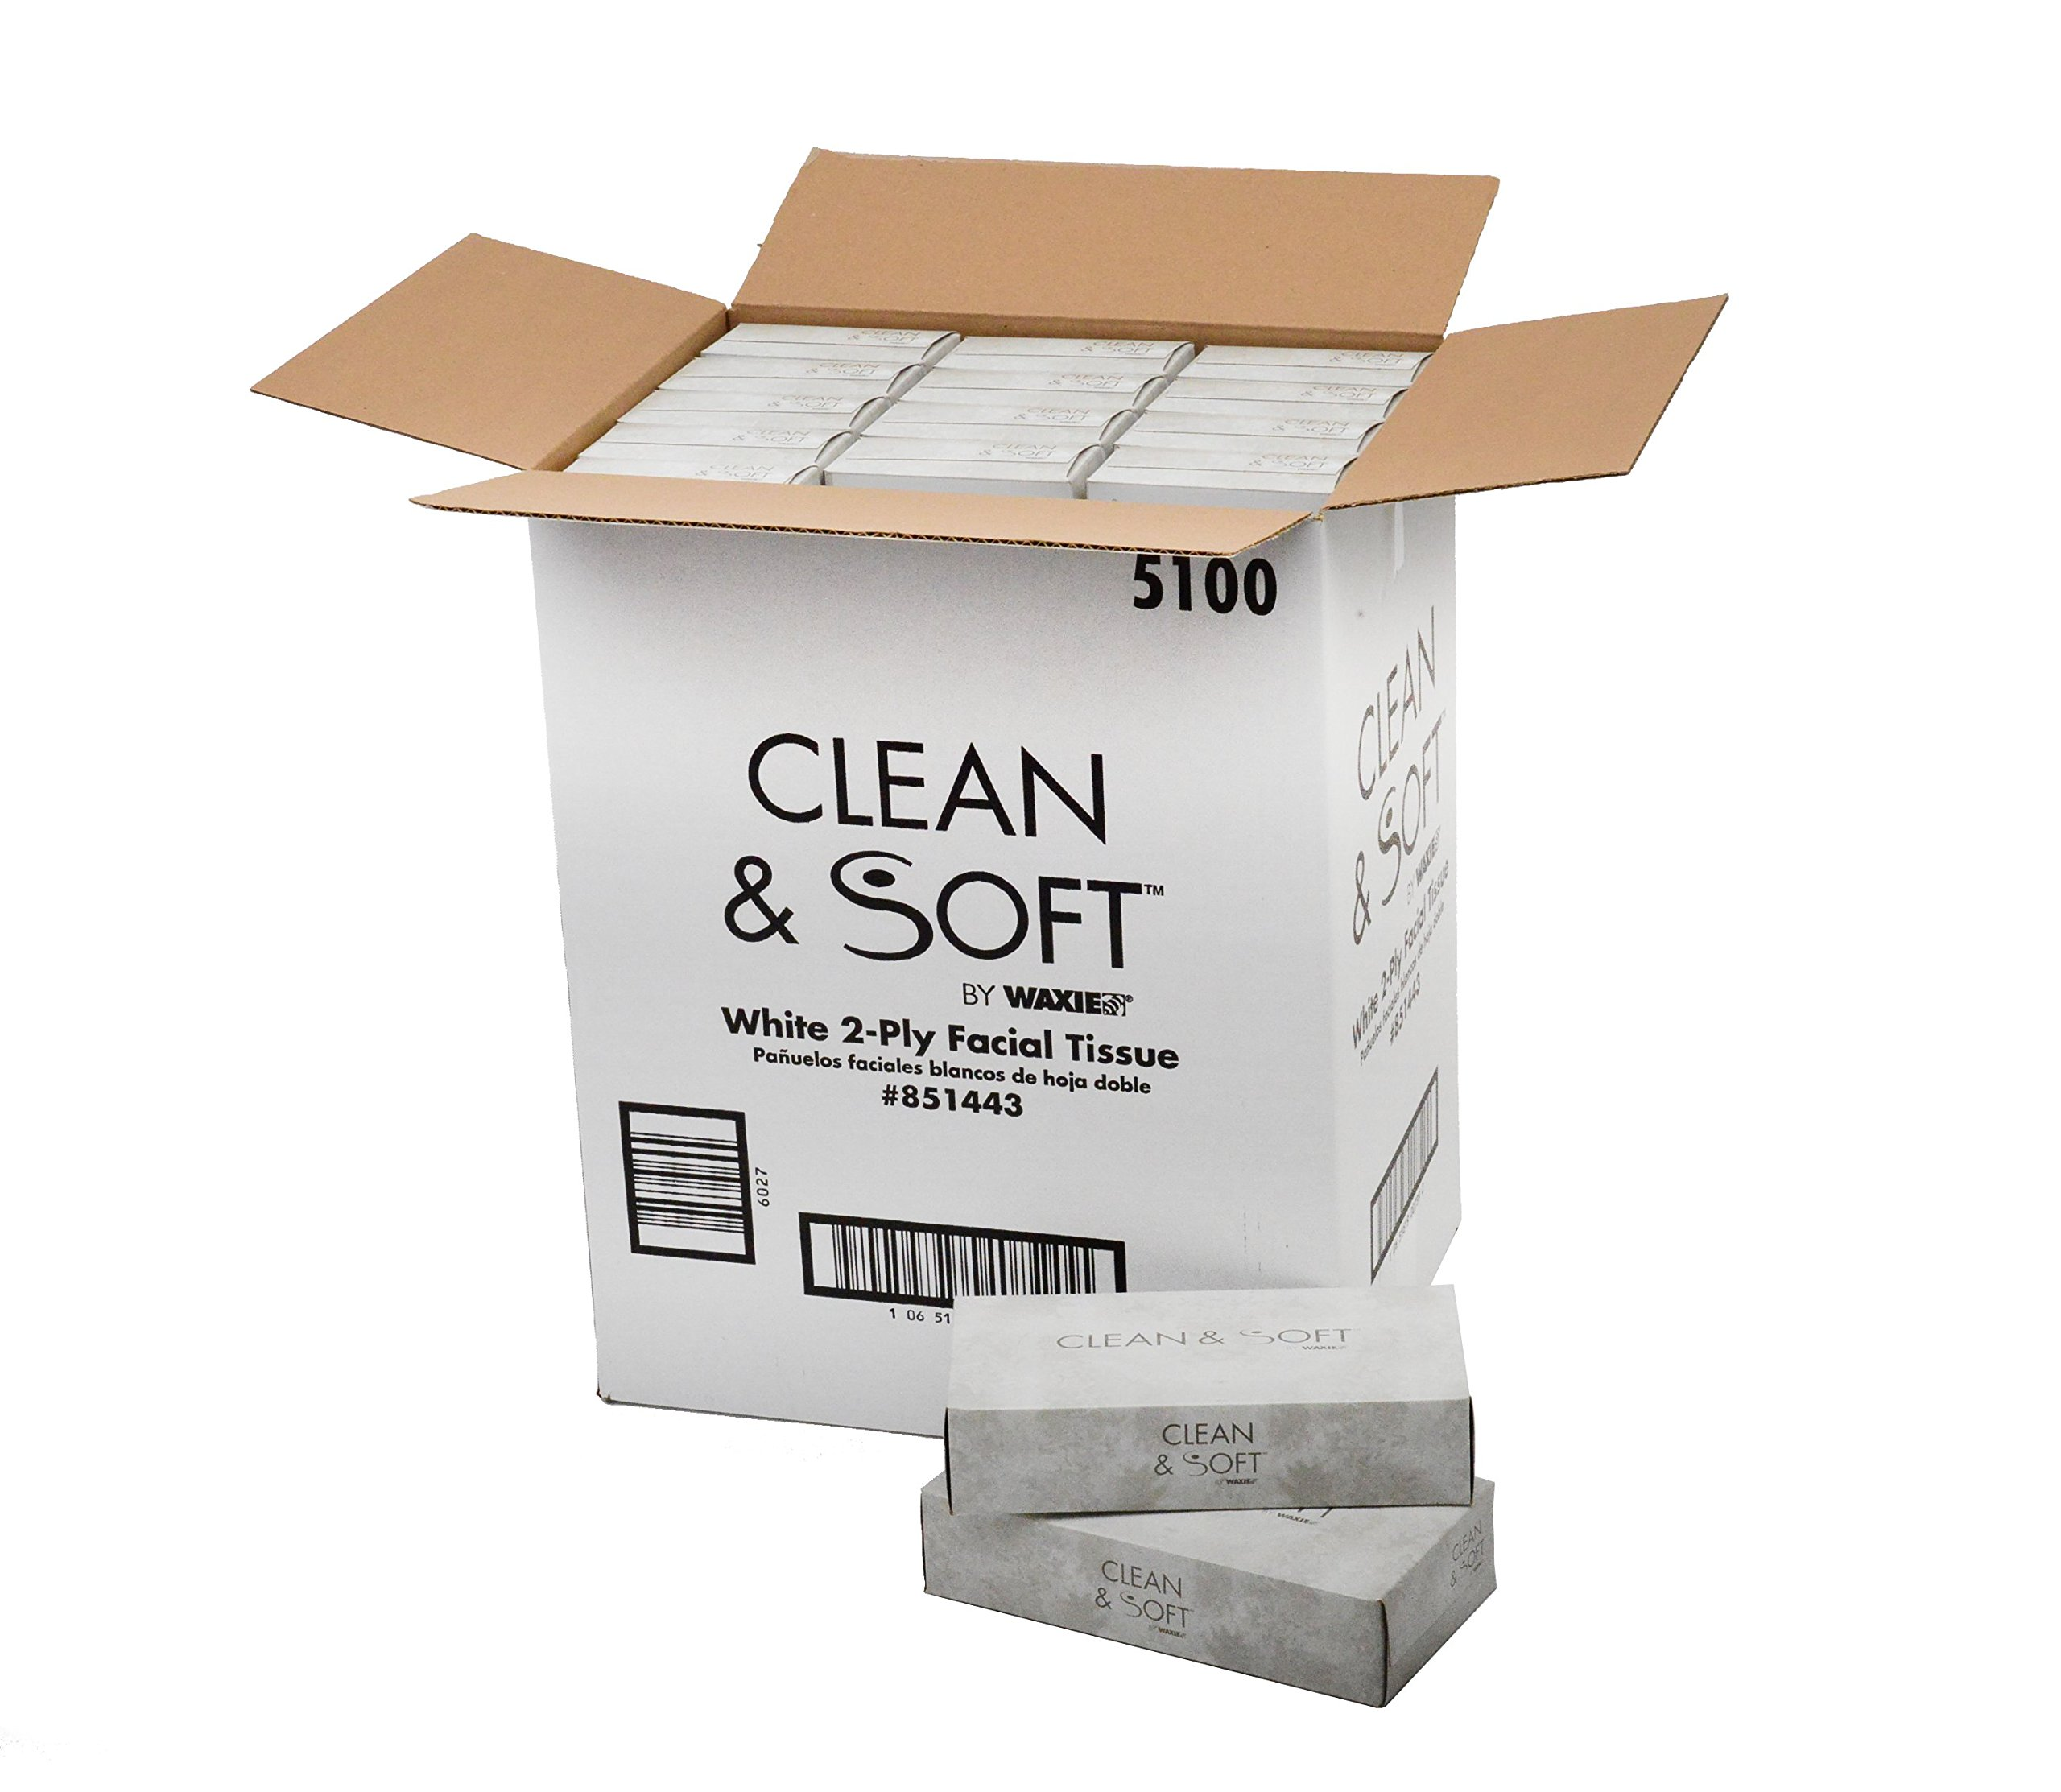 WAXIE 5100 Clean & Soft Facial Tissue, White, 2-Ply, 100 Sheets Per Box, 8.5'' X 7.7'' (Case of 30)